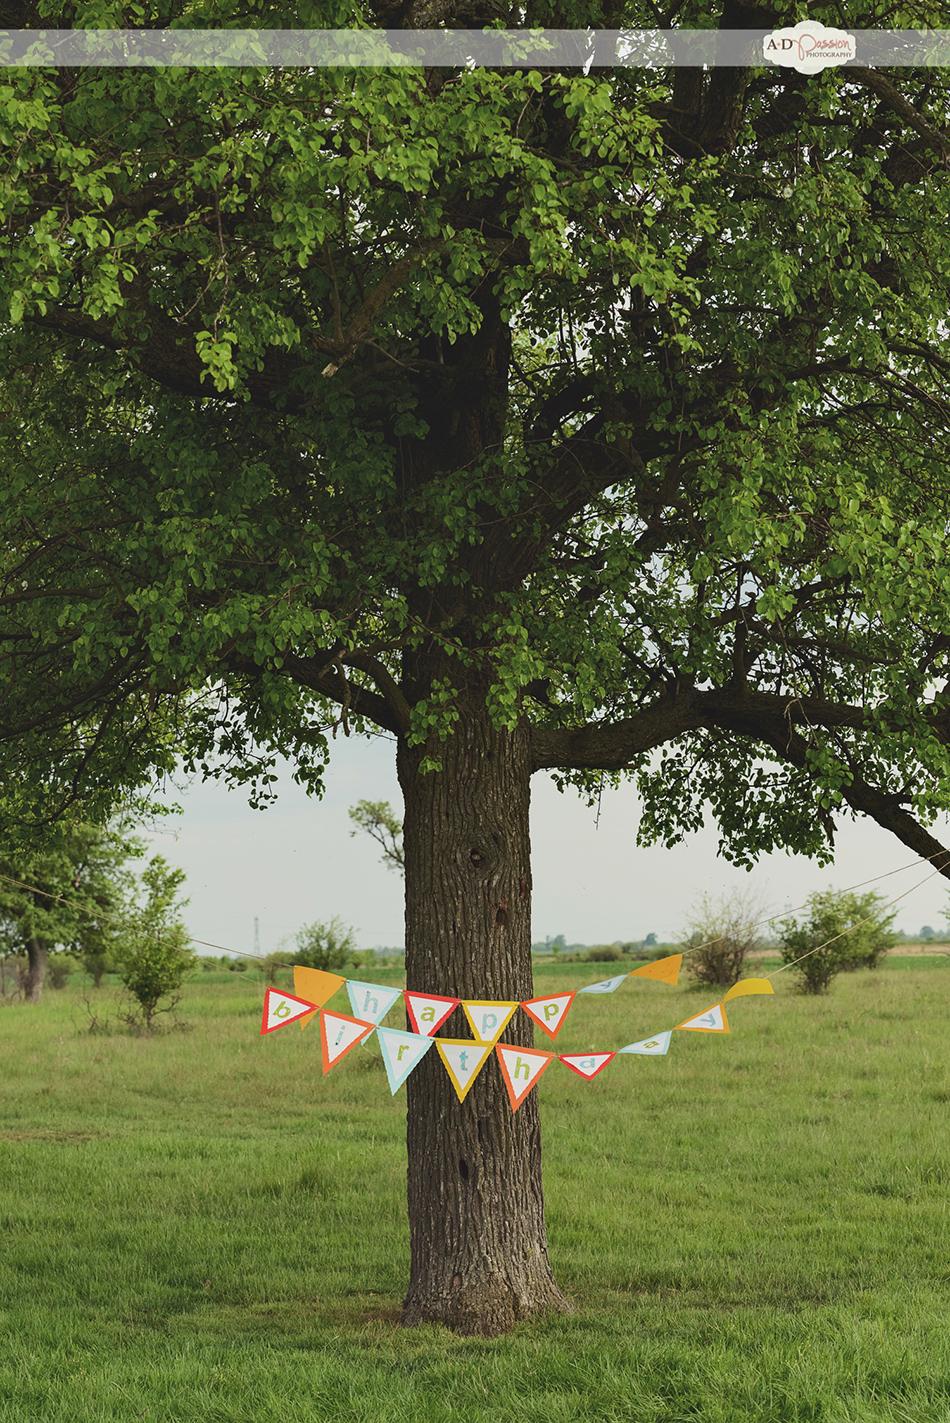 AD Passion Photography | aniversare-gabriel-sesiune-foto-de-familie_fotograf-profesionist_0001 | Adelin, Dida, fotograf profesionist, fotograf de nunta, fotografie de nunta, fotograf Timisoara, fotograf Craiova, fotograf Bucuresti, fotograf Arad, nunta Timisoara, nunta Arad, nunta Bucuresti, nunta Craiova